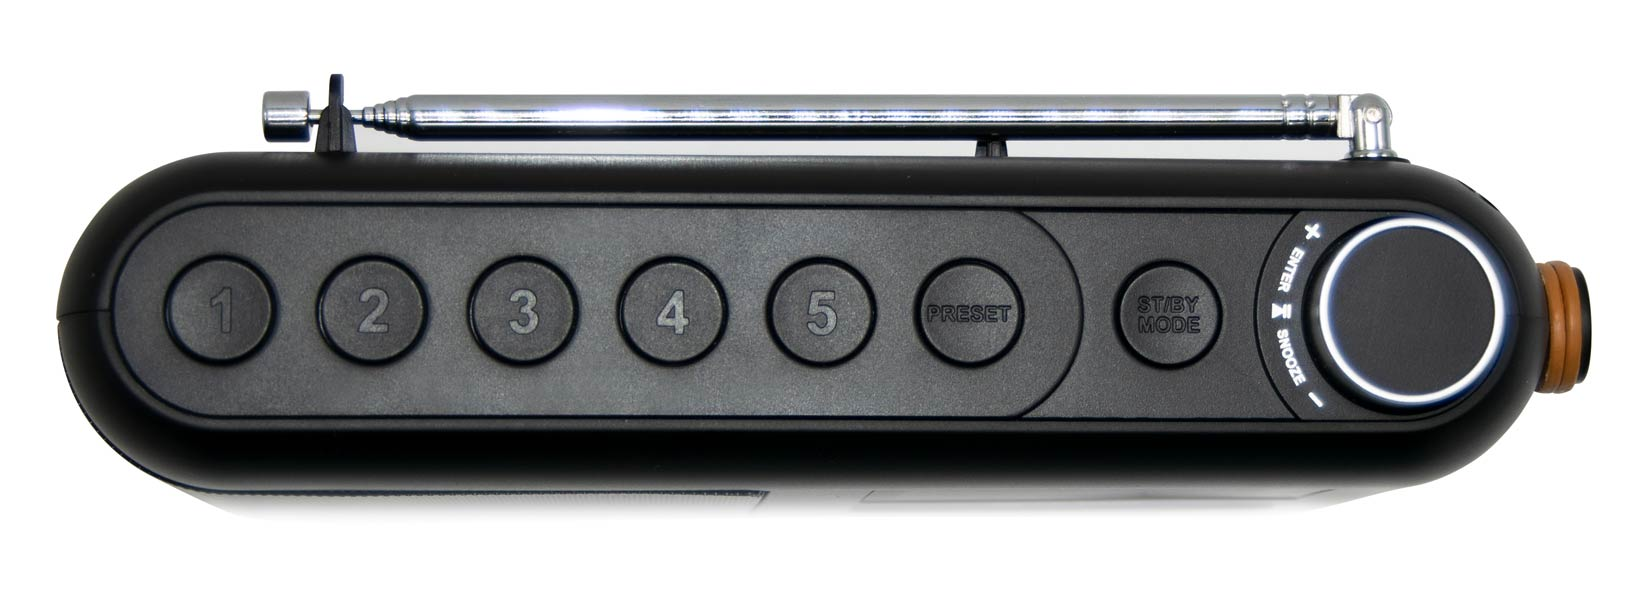 Richter Portable Digital Radio RR20 Top Closeup